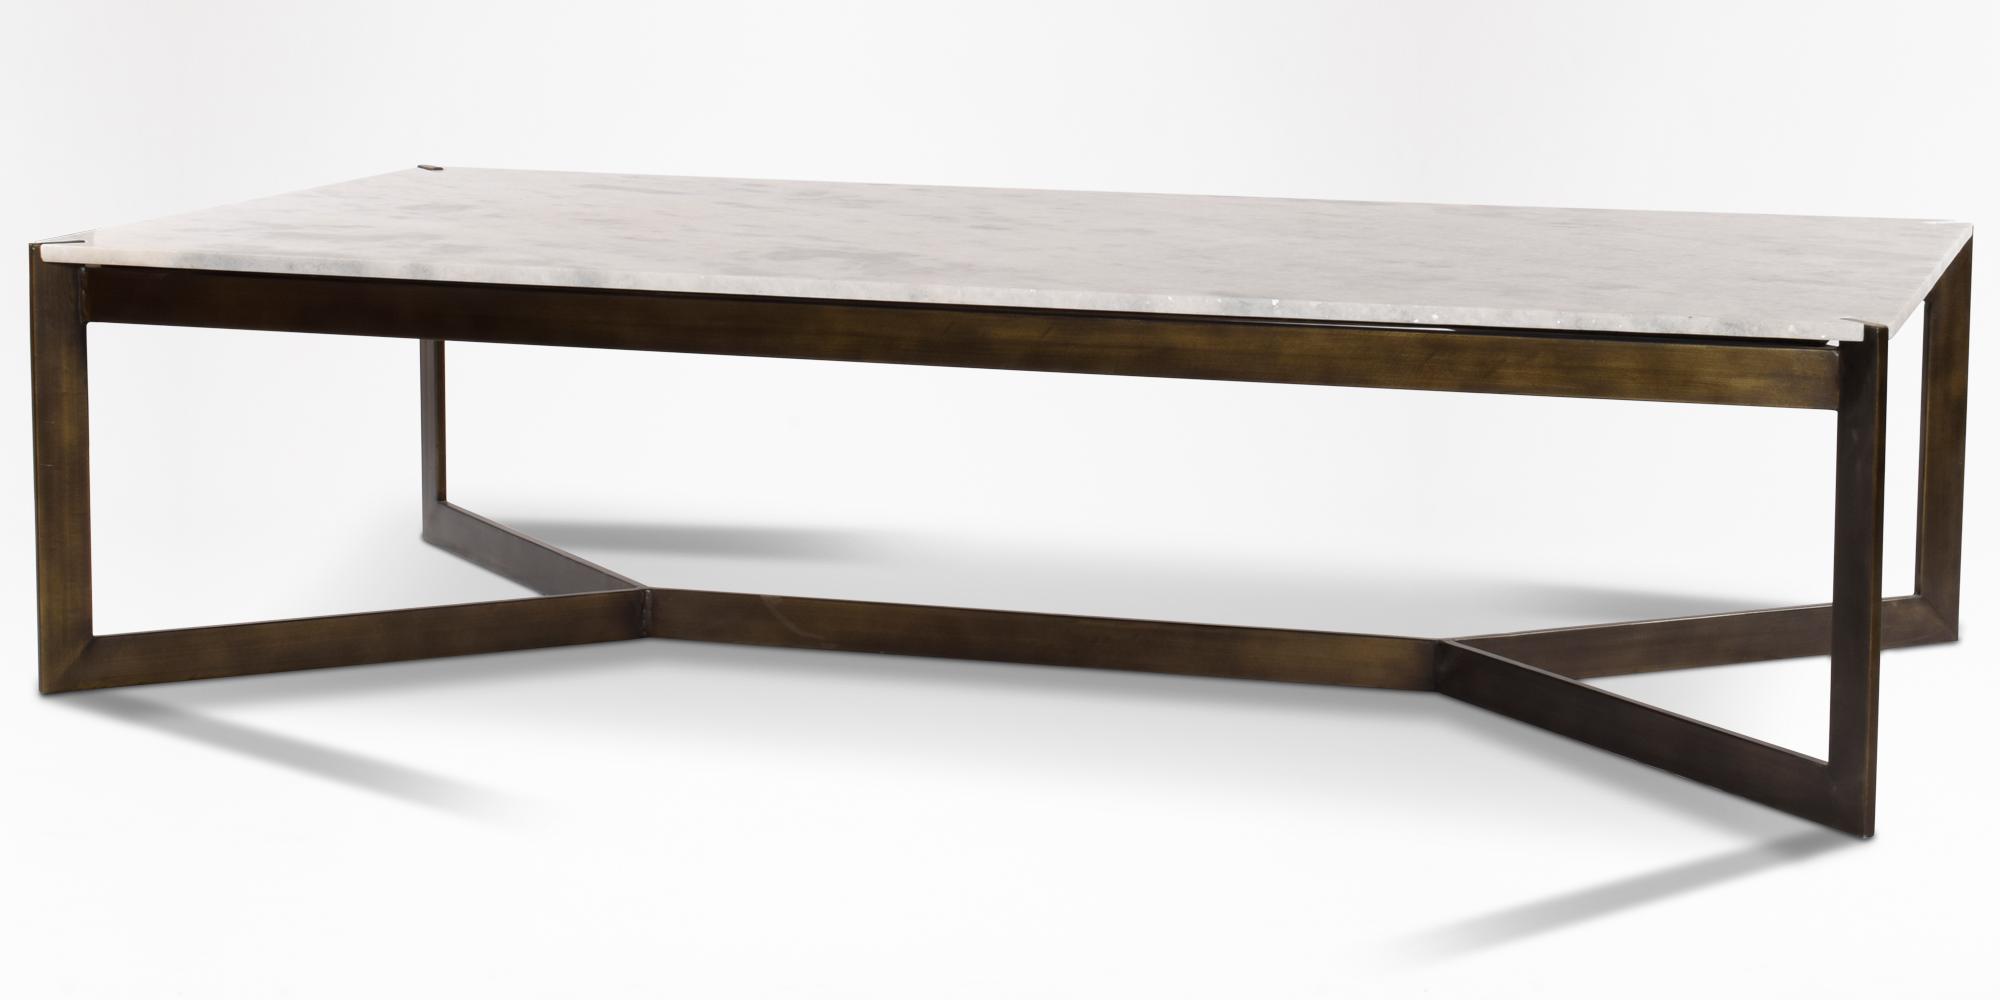 Titus Rectangular Coffee Table Coffee Tables Living Room Living Room Coricraft Rectangular Coffee Table Living Room Coffee Table Coffee Table [ 1000 x 2000 Pixel ]